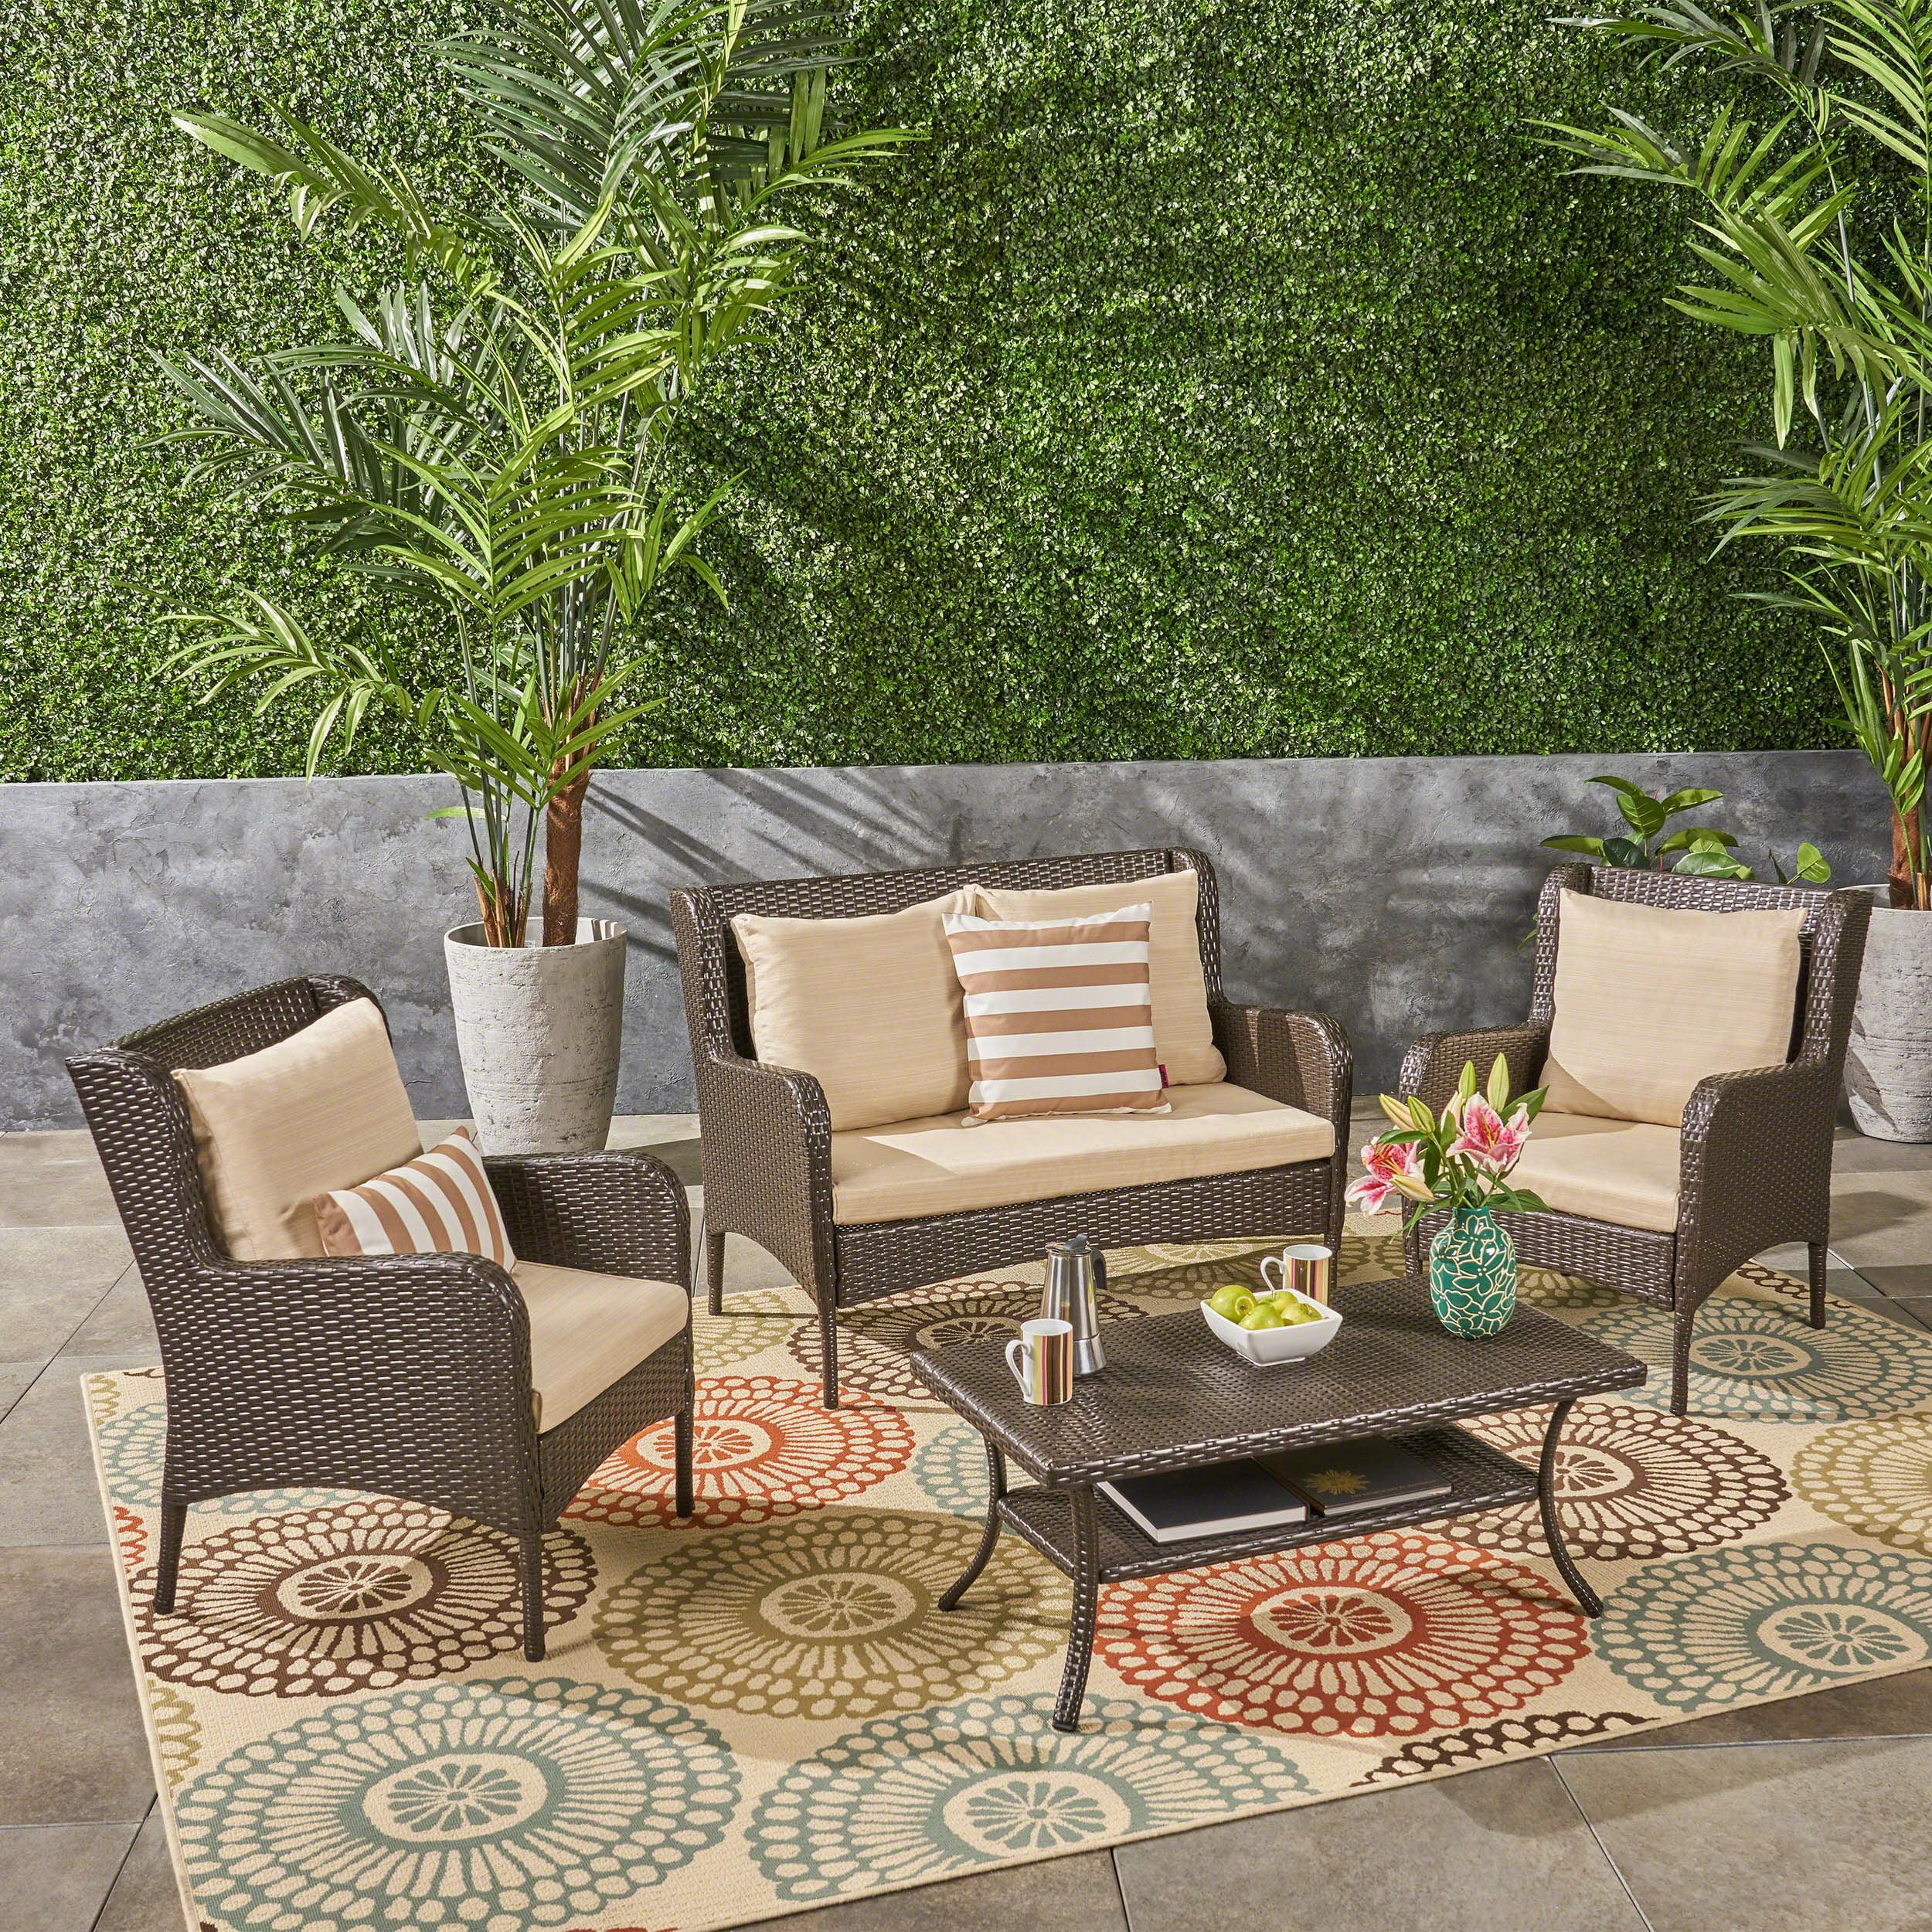 Jaylen Outdoor 4 Piece Wicker Chat Set with Cushions, Dark Gray, Silver